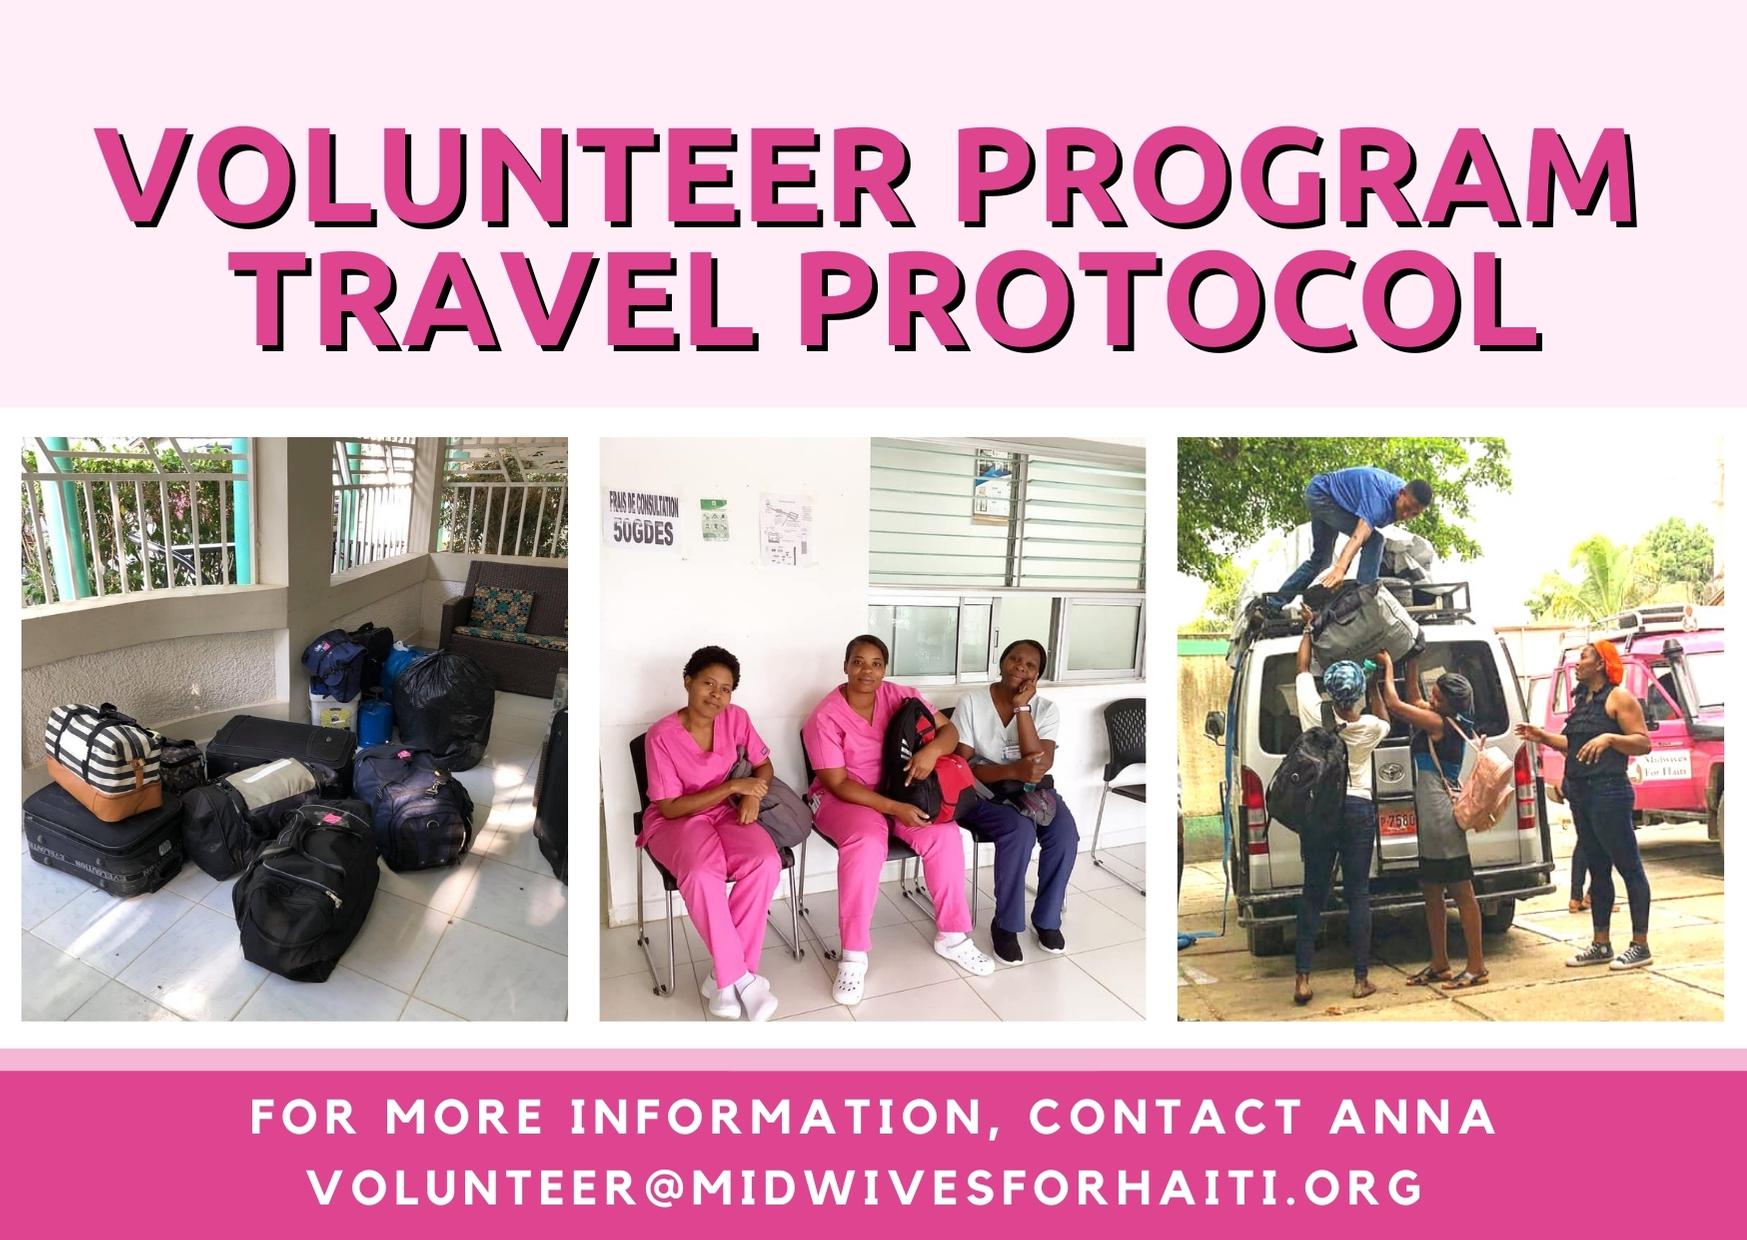 Volunteer Travel Protocol